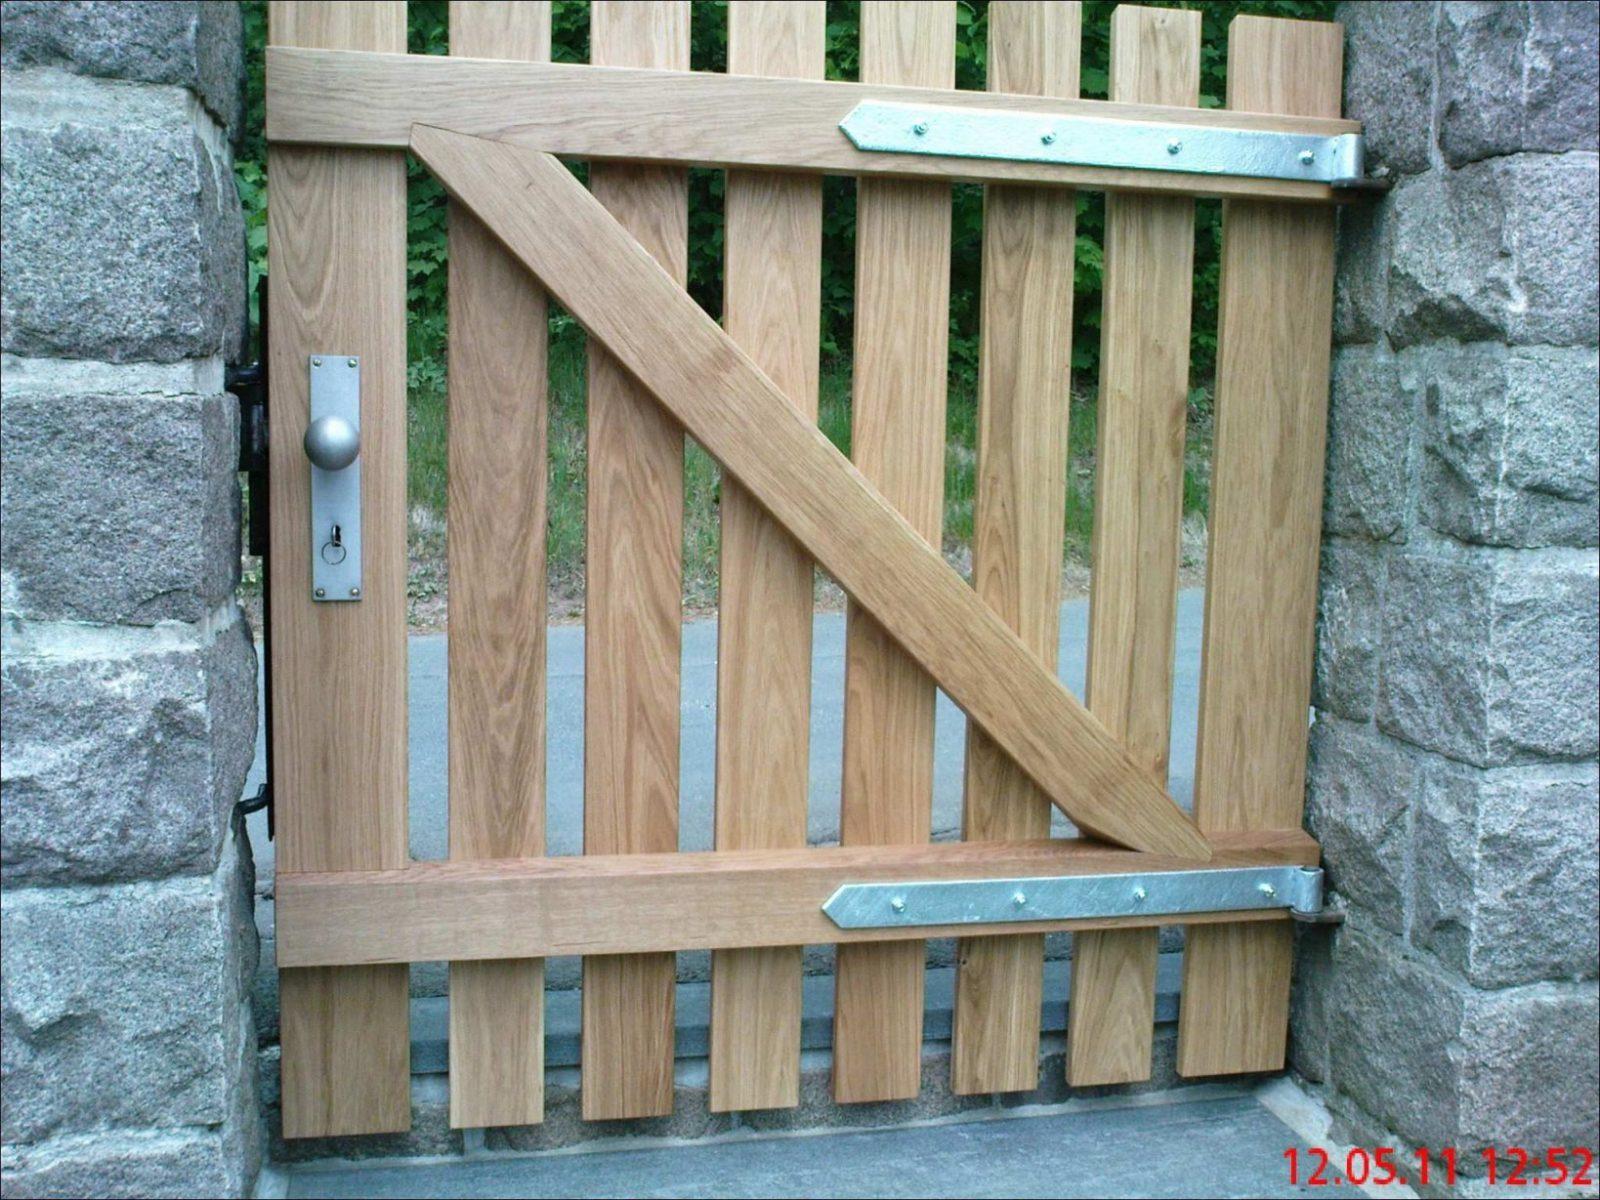 Gartentor Holz Selber Bauen Fotos Gartentor Selber Bauen Metall Für von Gartentor Holz Selber Bauen Photo